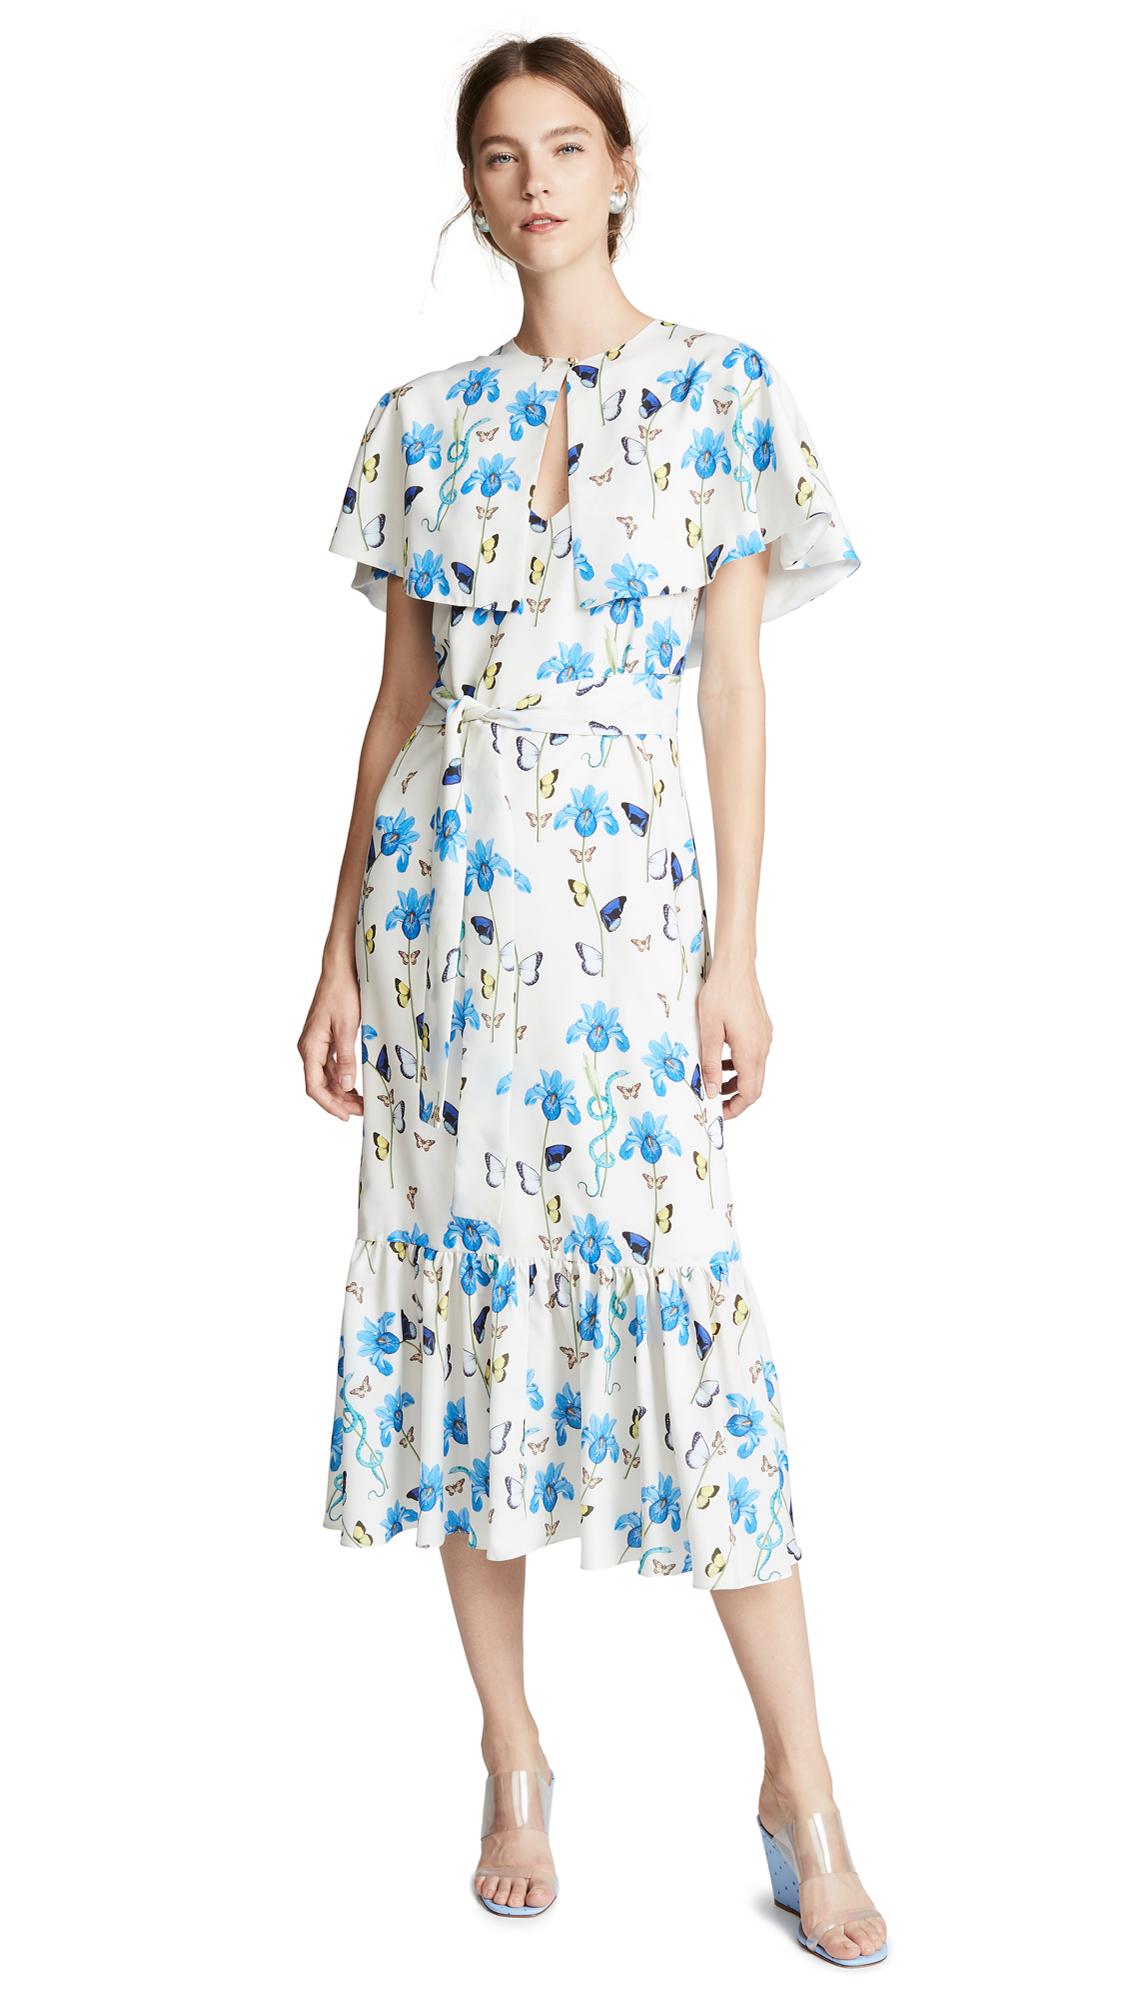 Borgo de Nor Margarita Dress In Iris/White